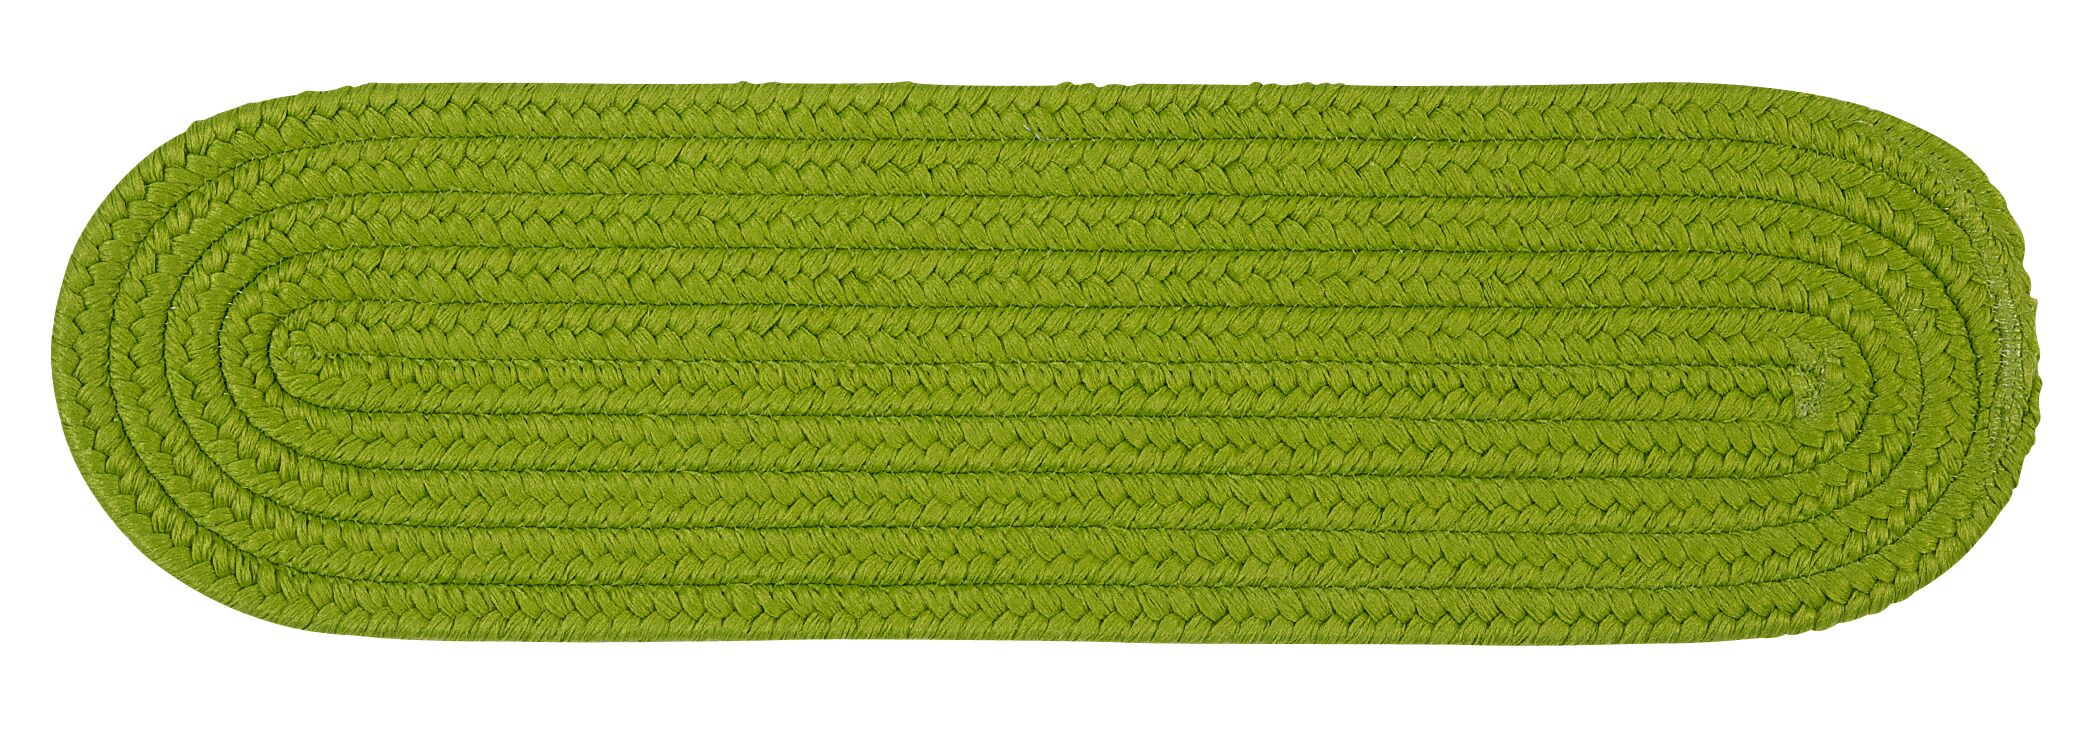 Mcintyre Bright Green Stair Tread Quantity: Set of 13